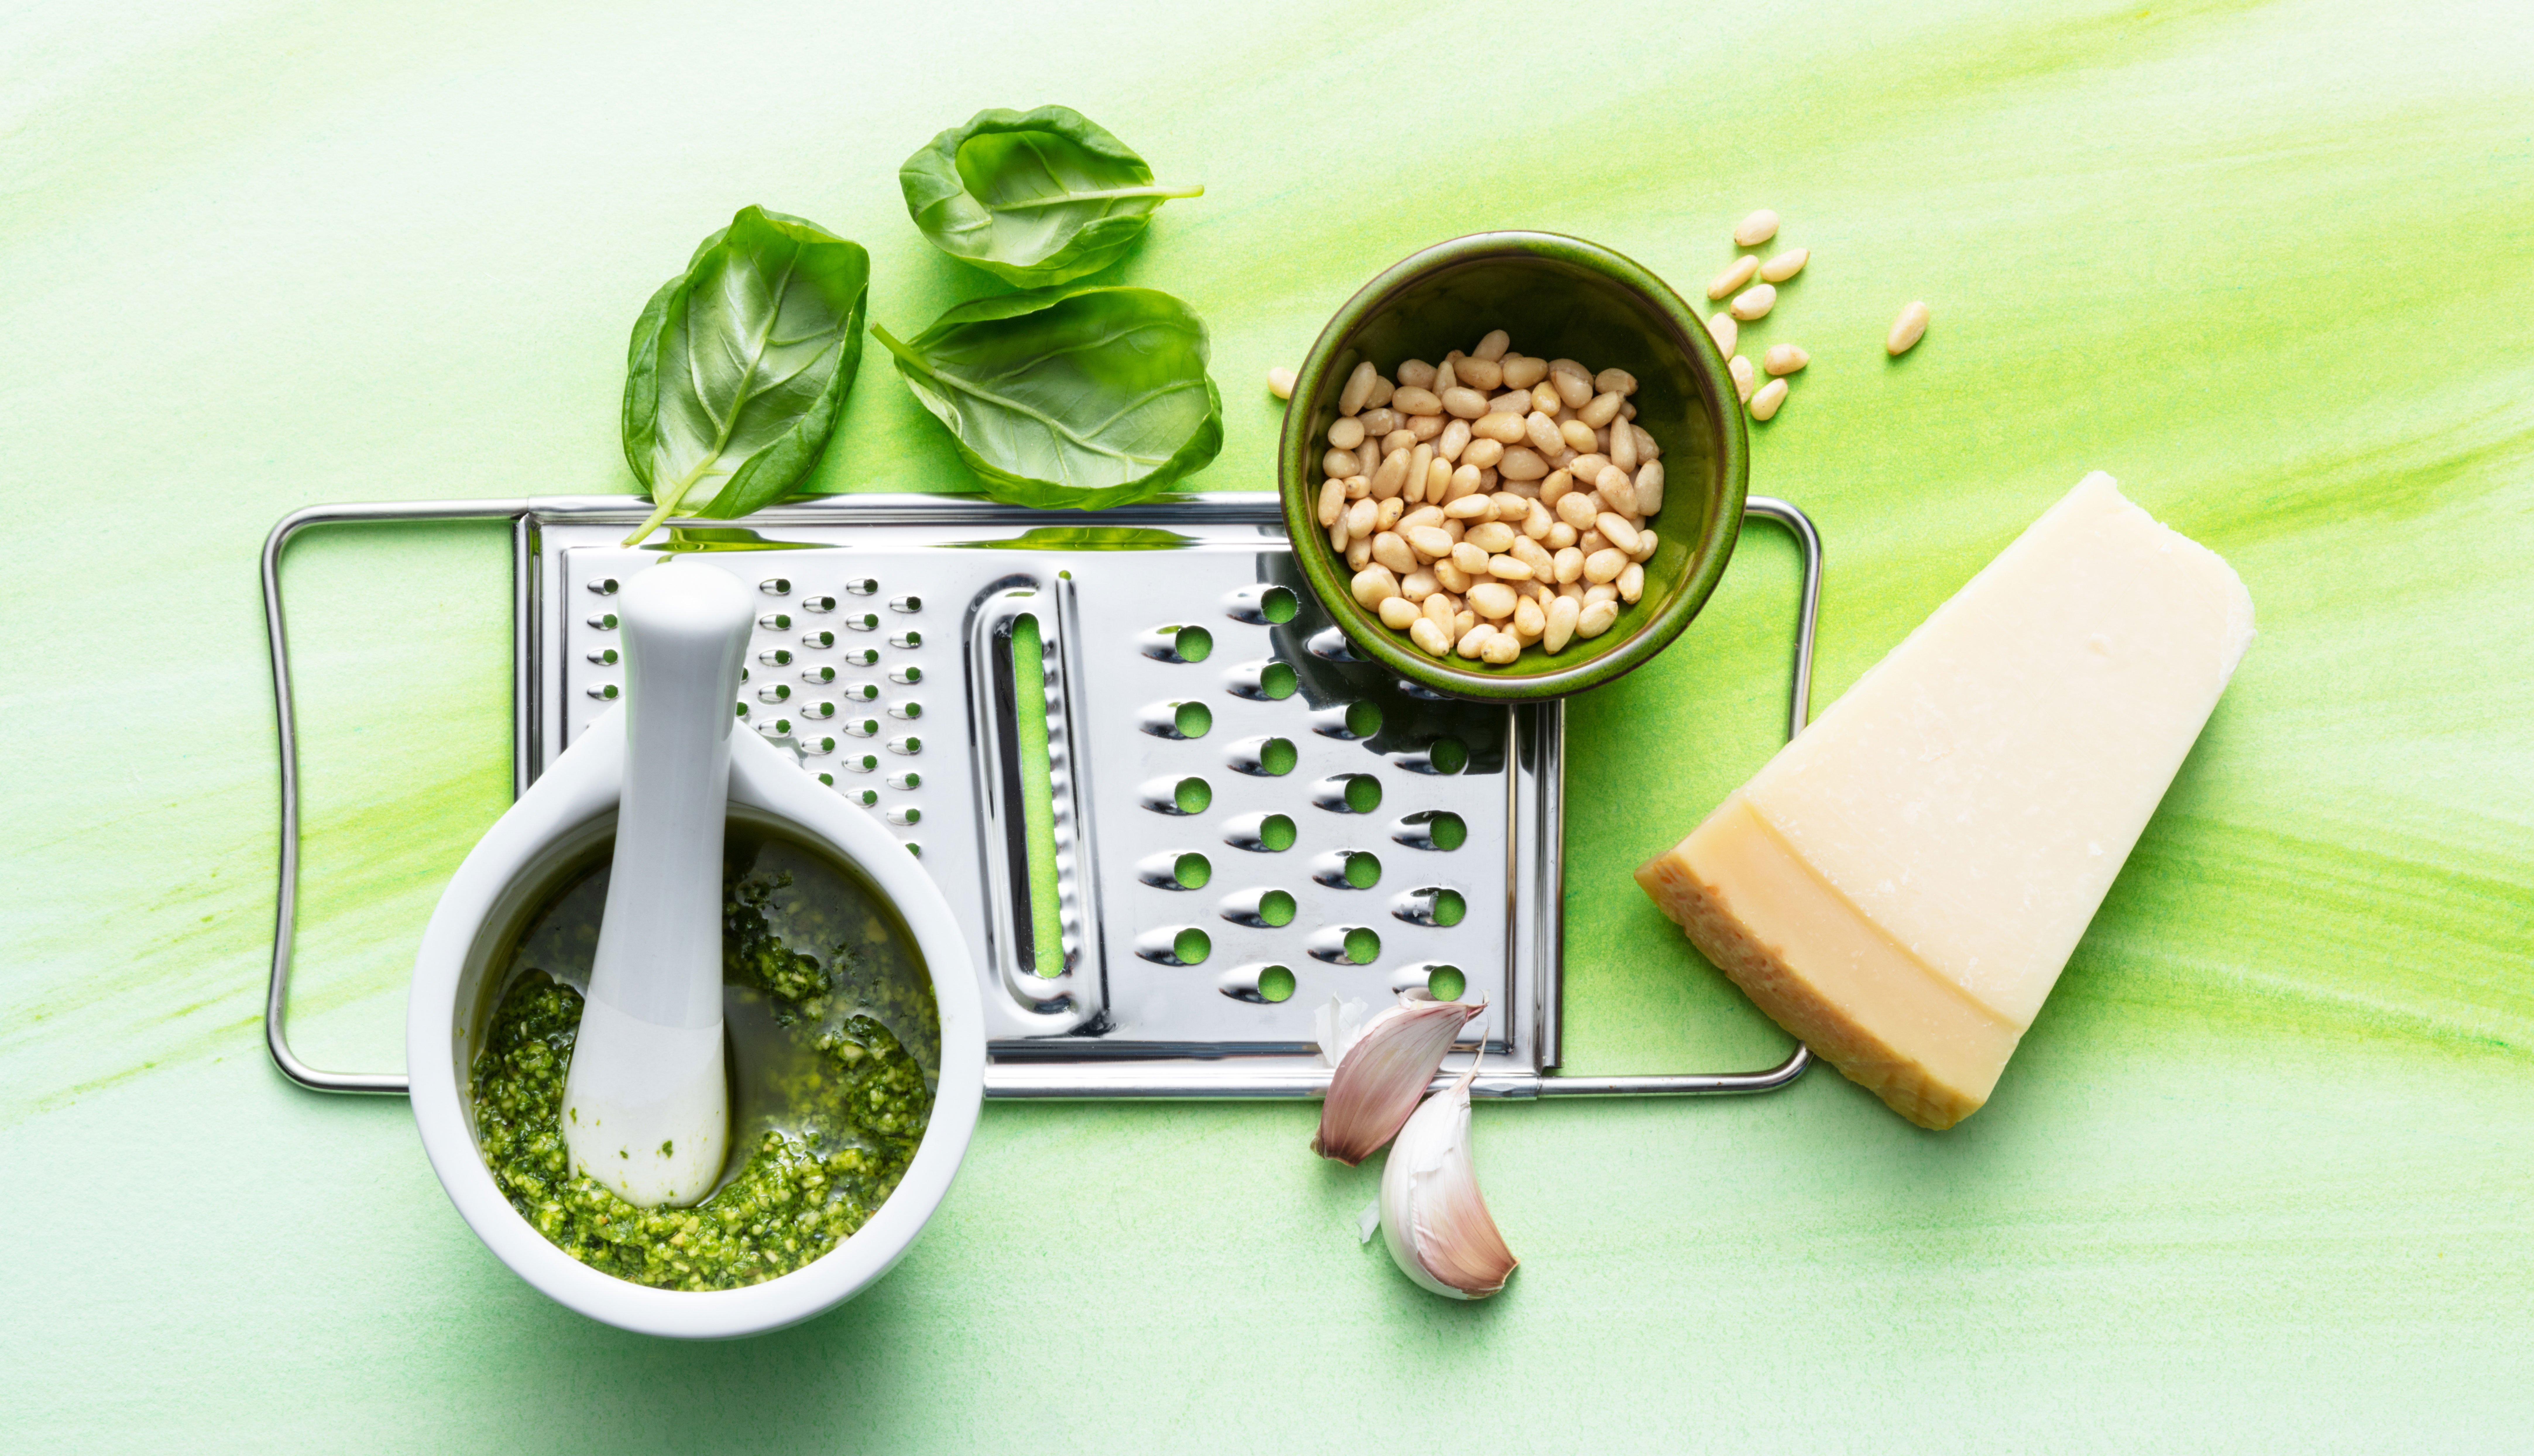 Ingredientes para preparar salsa pesto